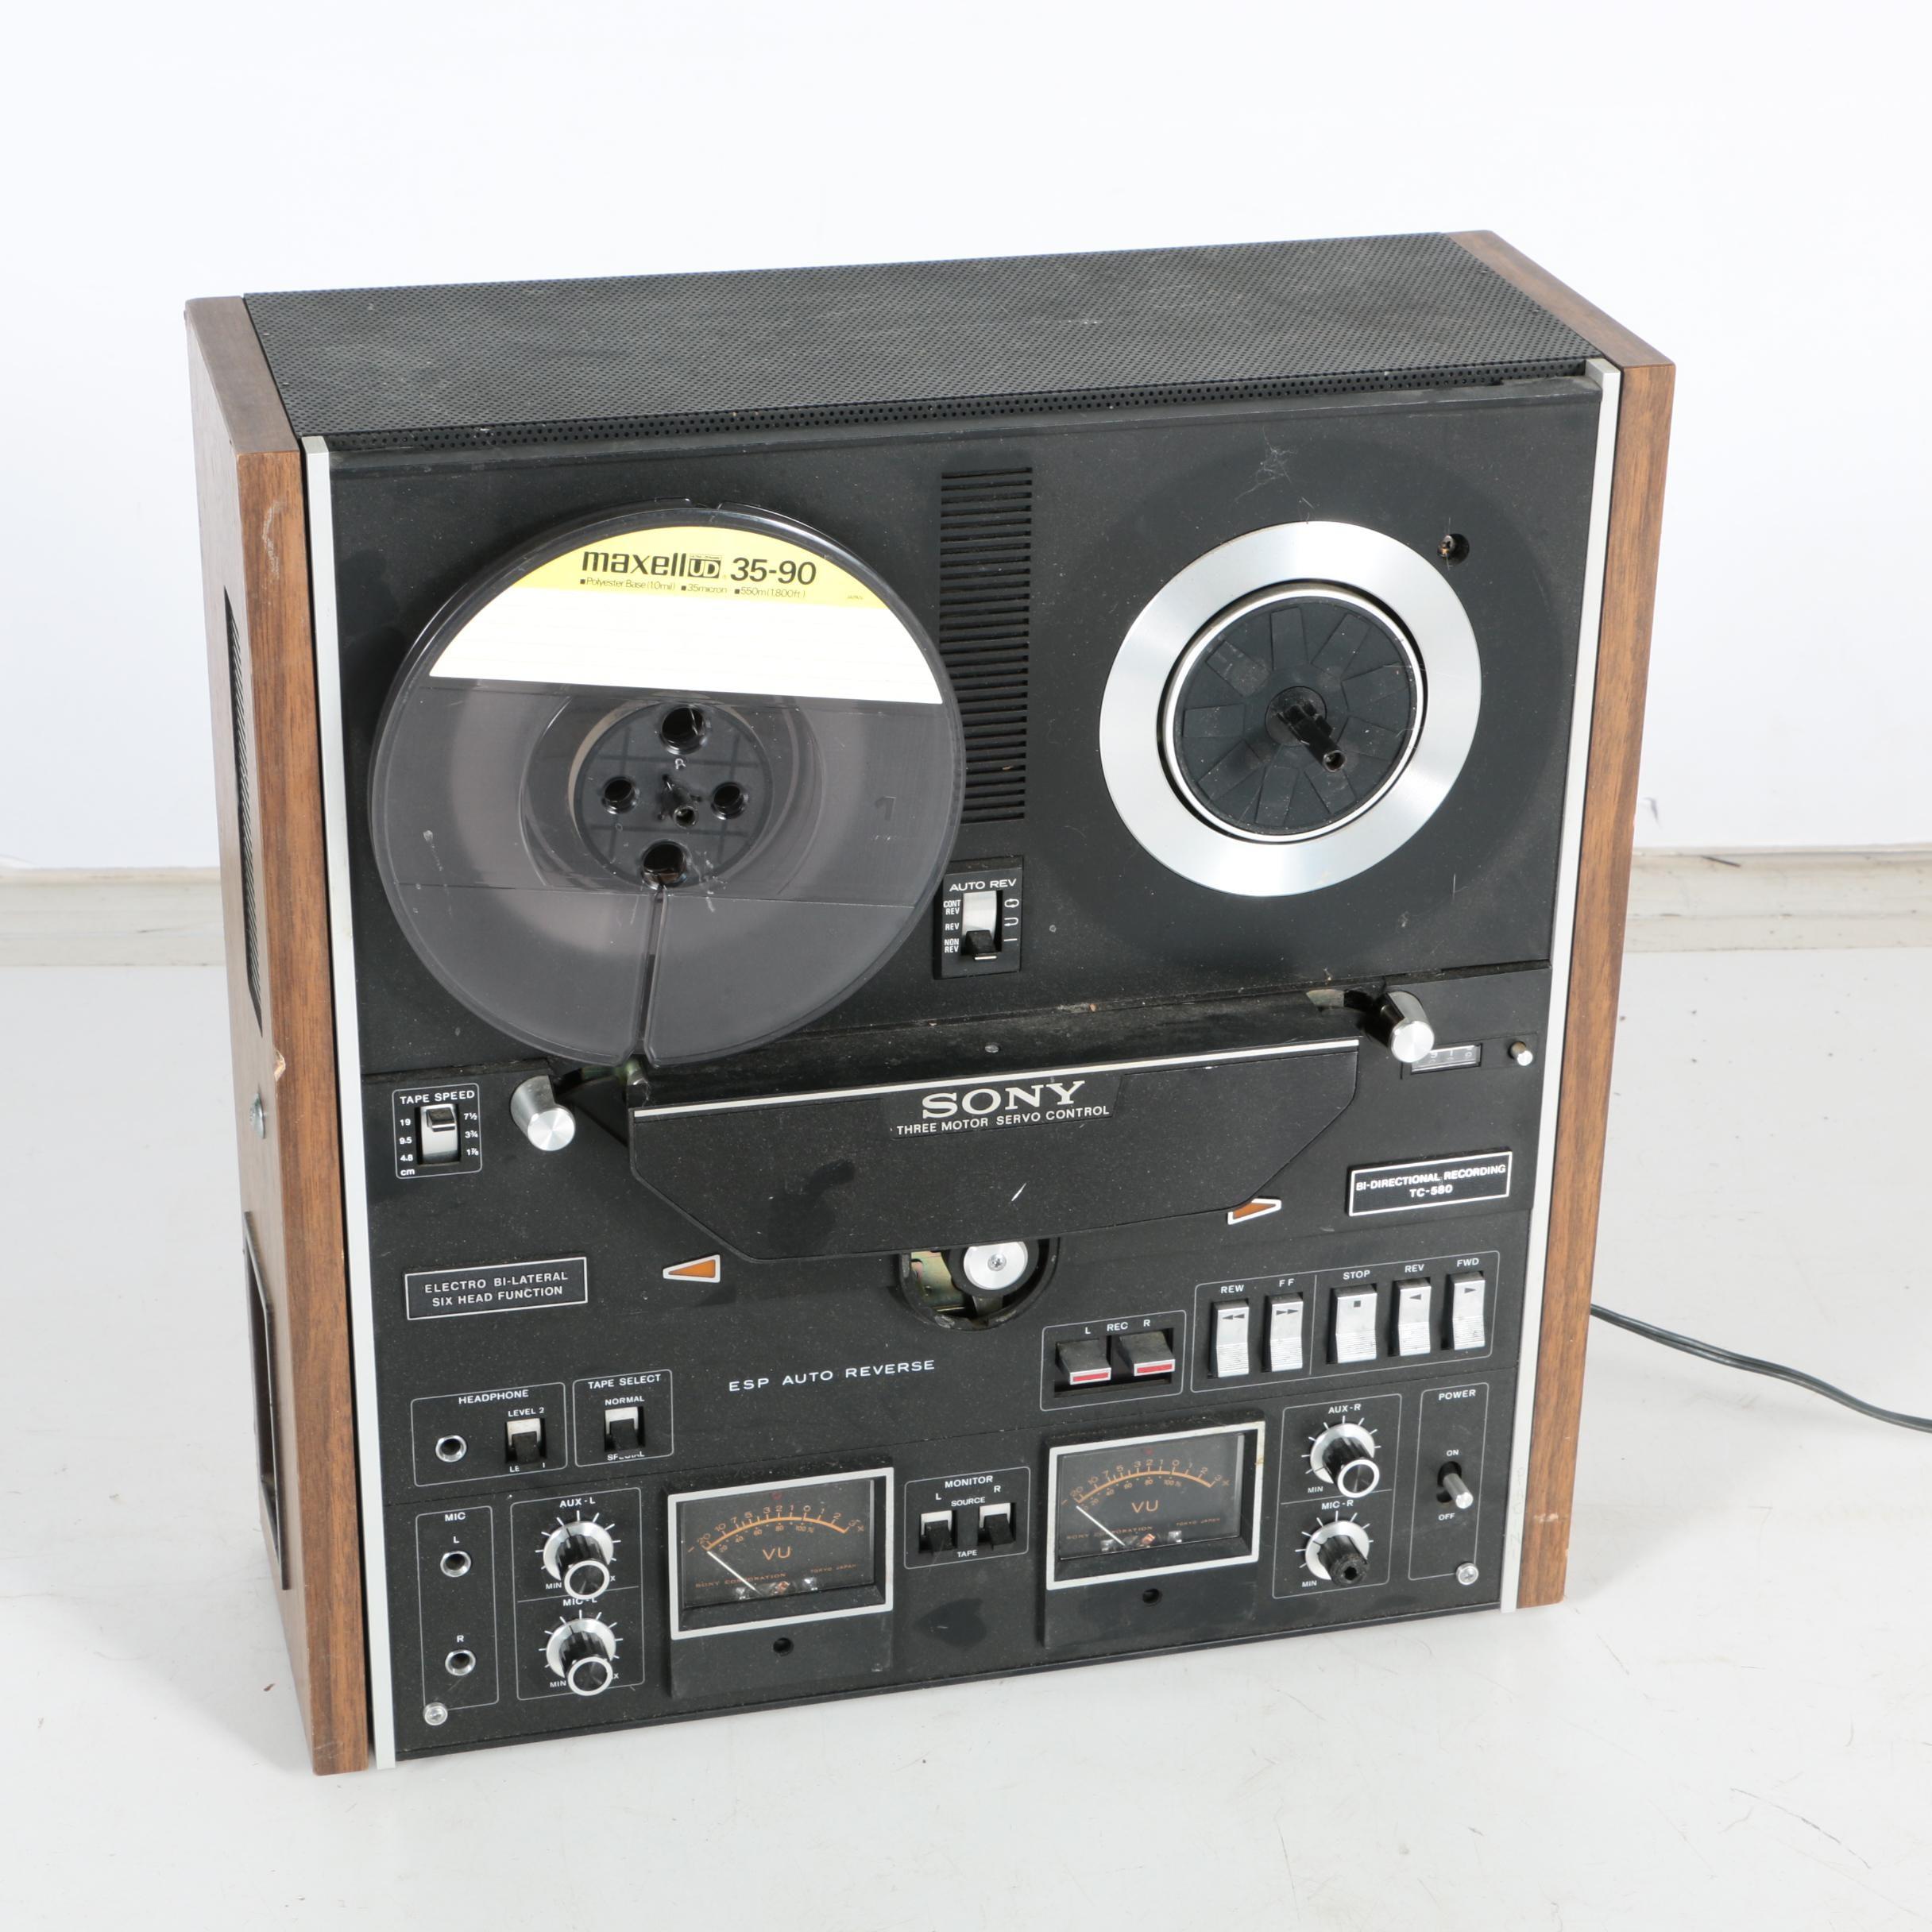 Sony Reel-to-Reel Tape Recorder